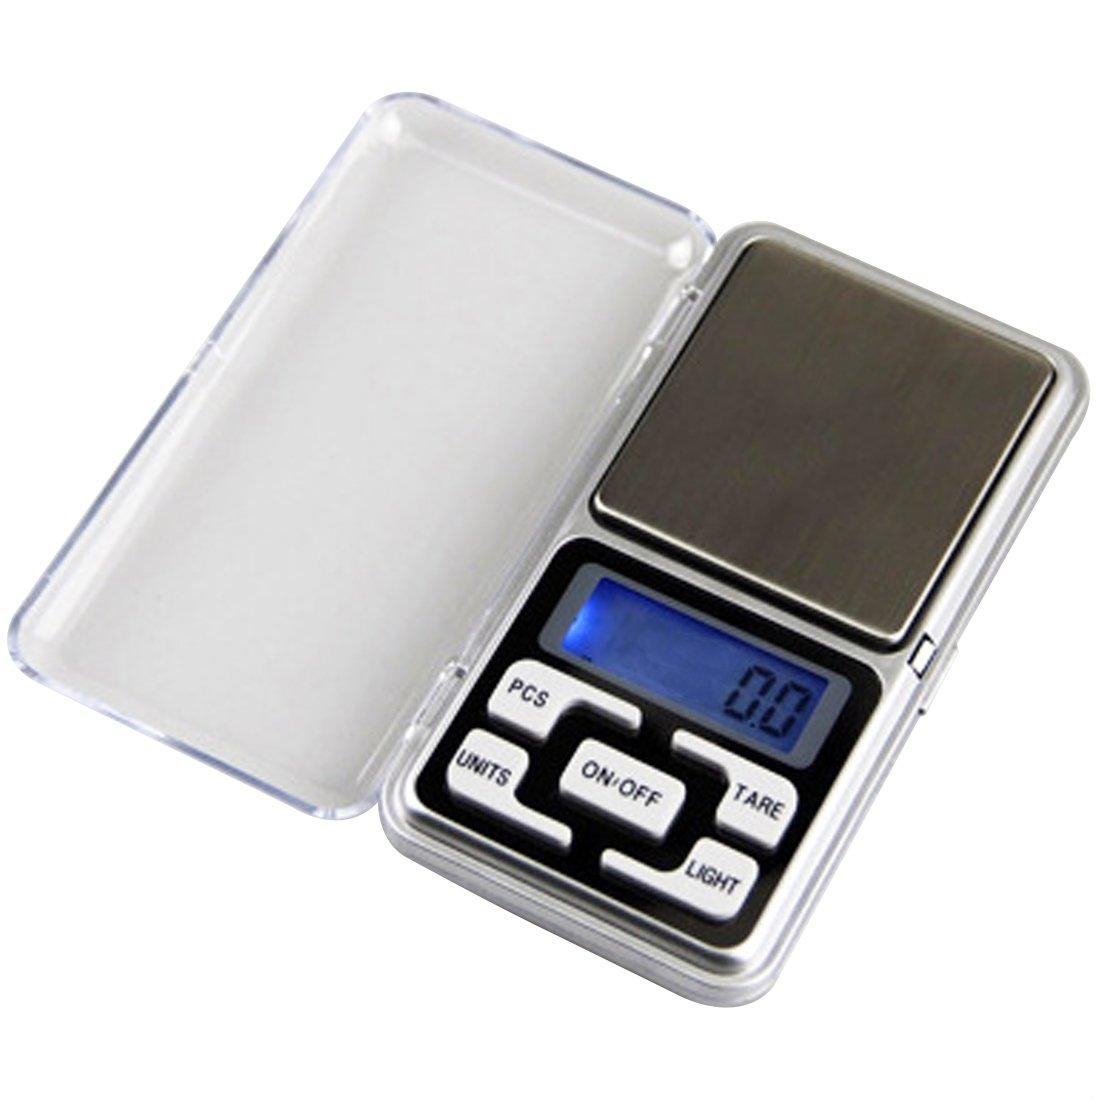 200g/0.01g Precision Mini Digital Jewelry Pocket Scale dufu-beauty-store